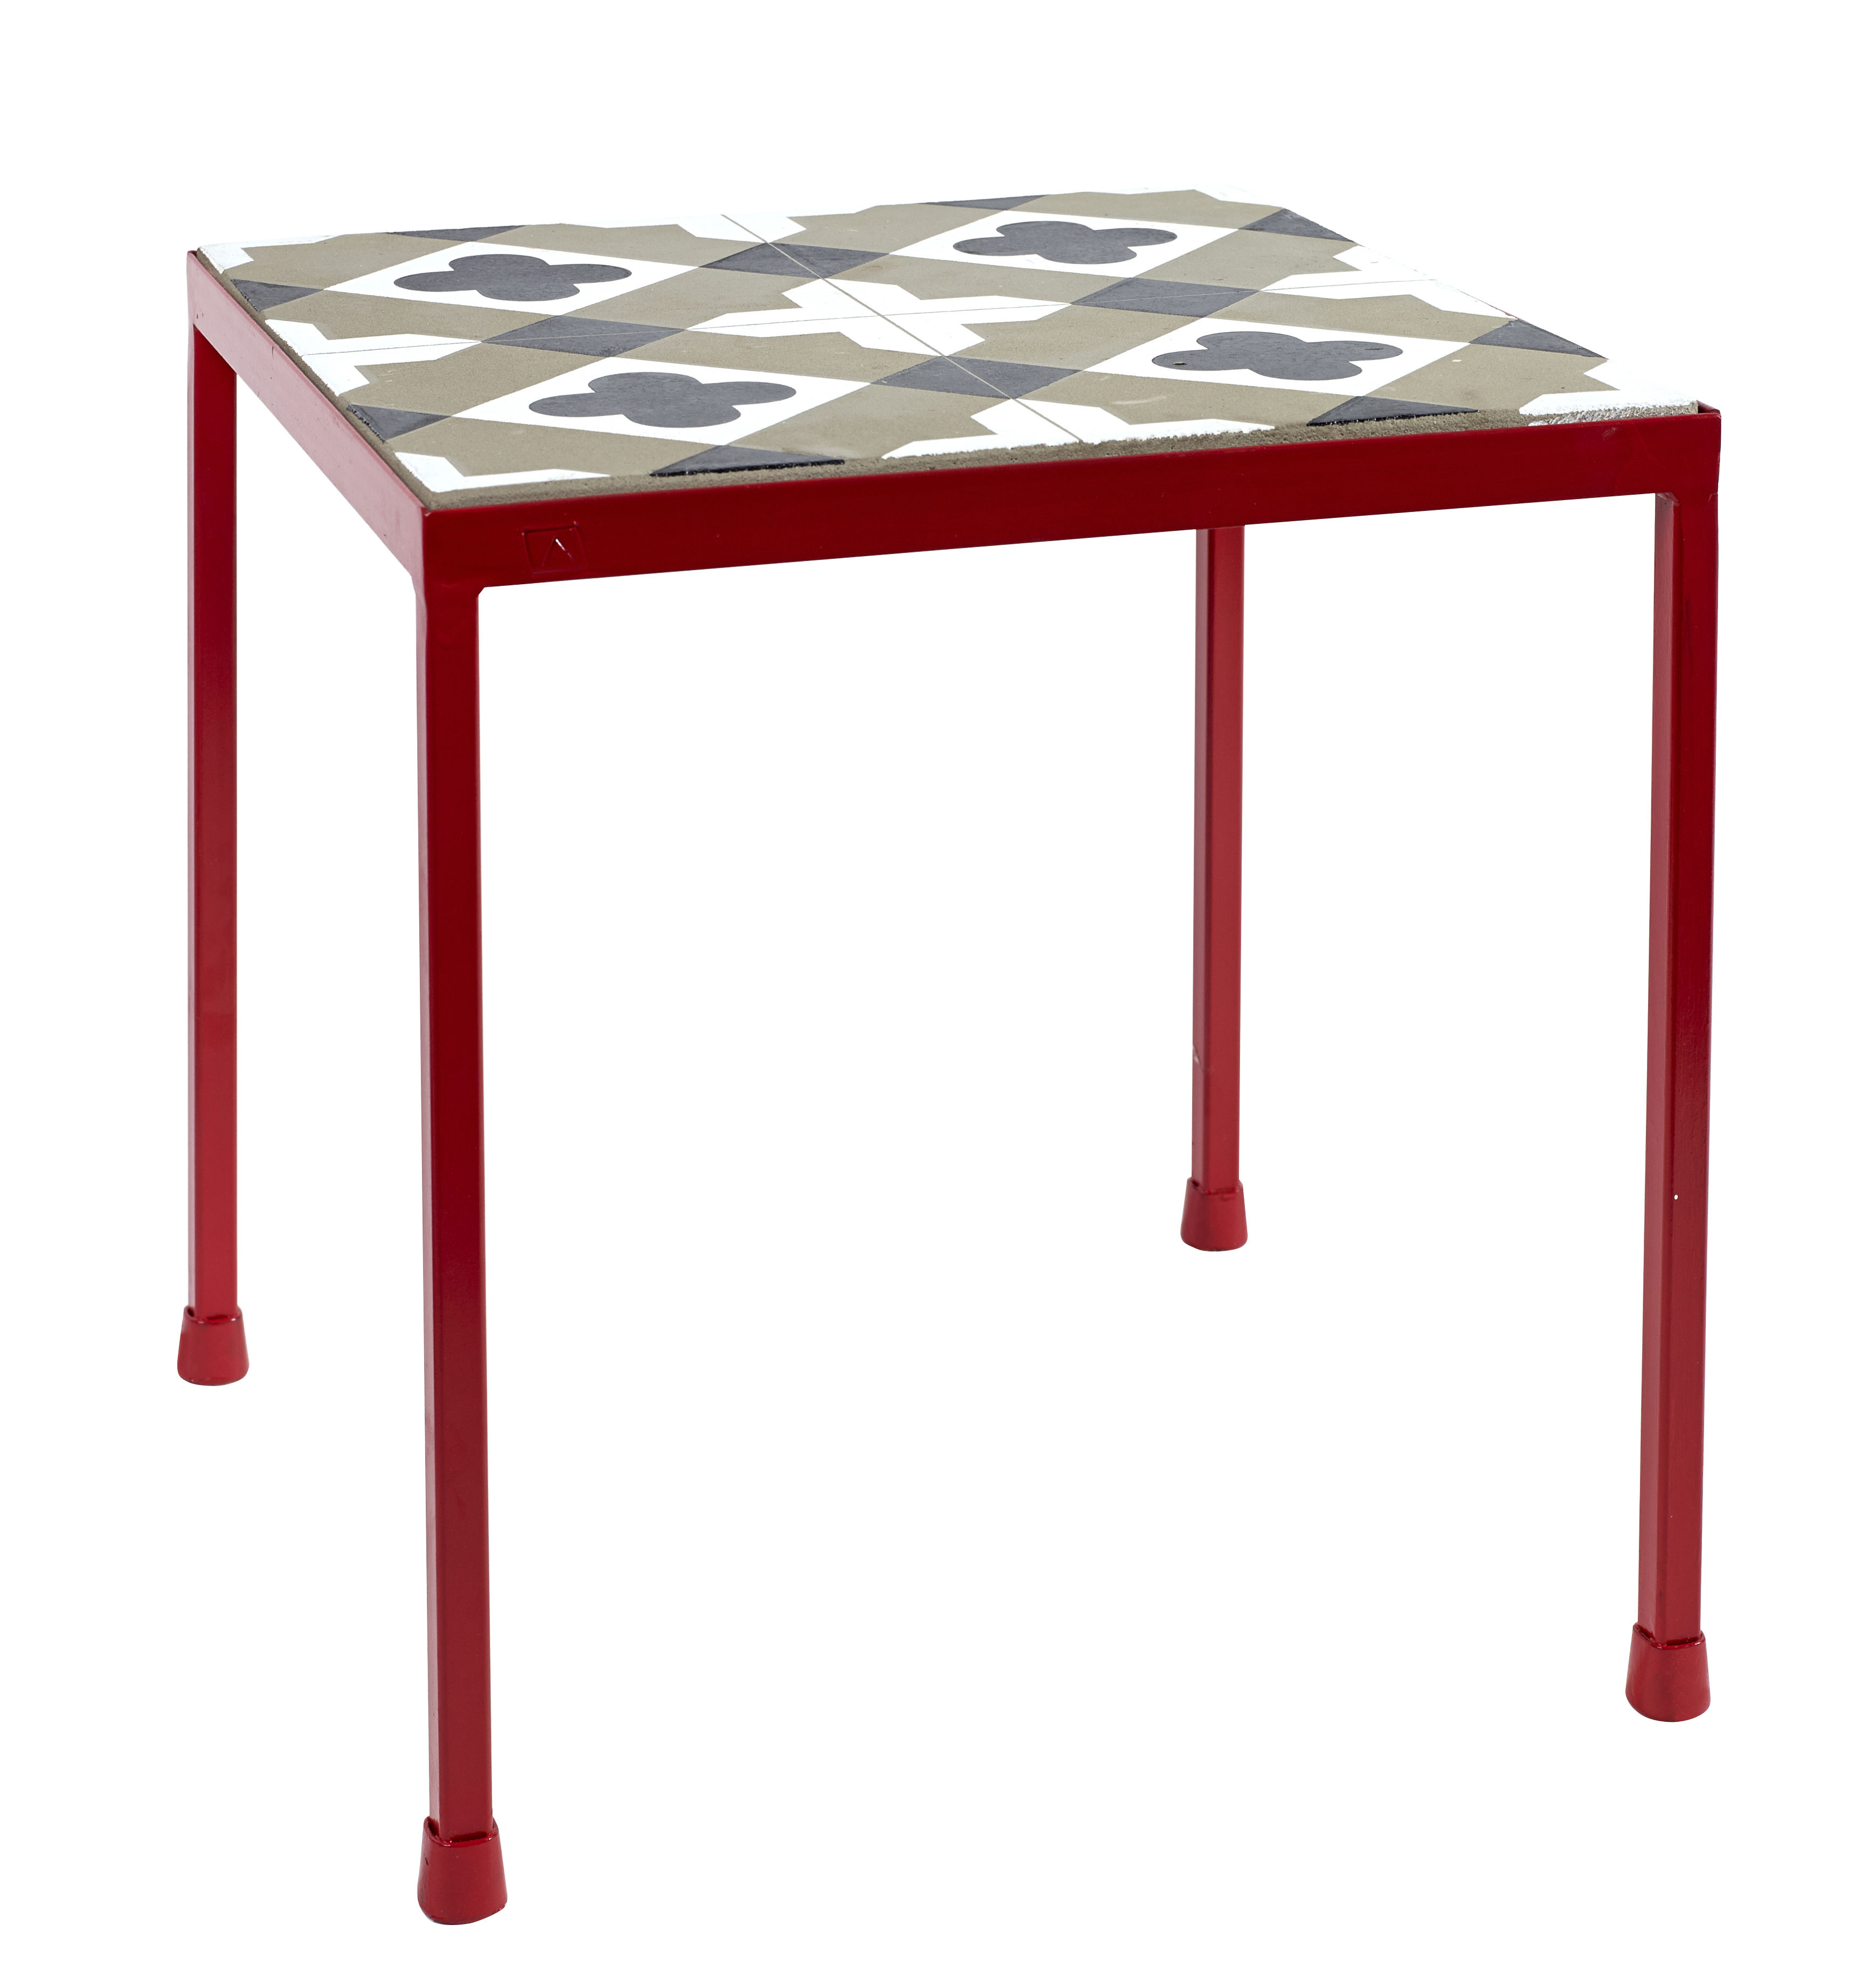 Furniture - Coffee Tables - Feeling End table - Concrete - 40 x 40 cm by Serax - Grey & Black / red legs - Concrete, Metal